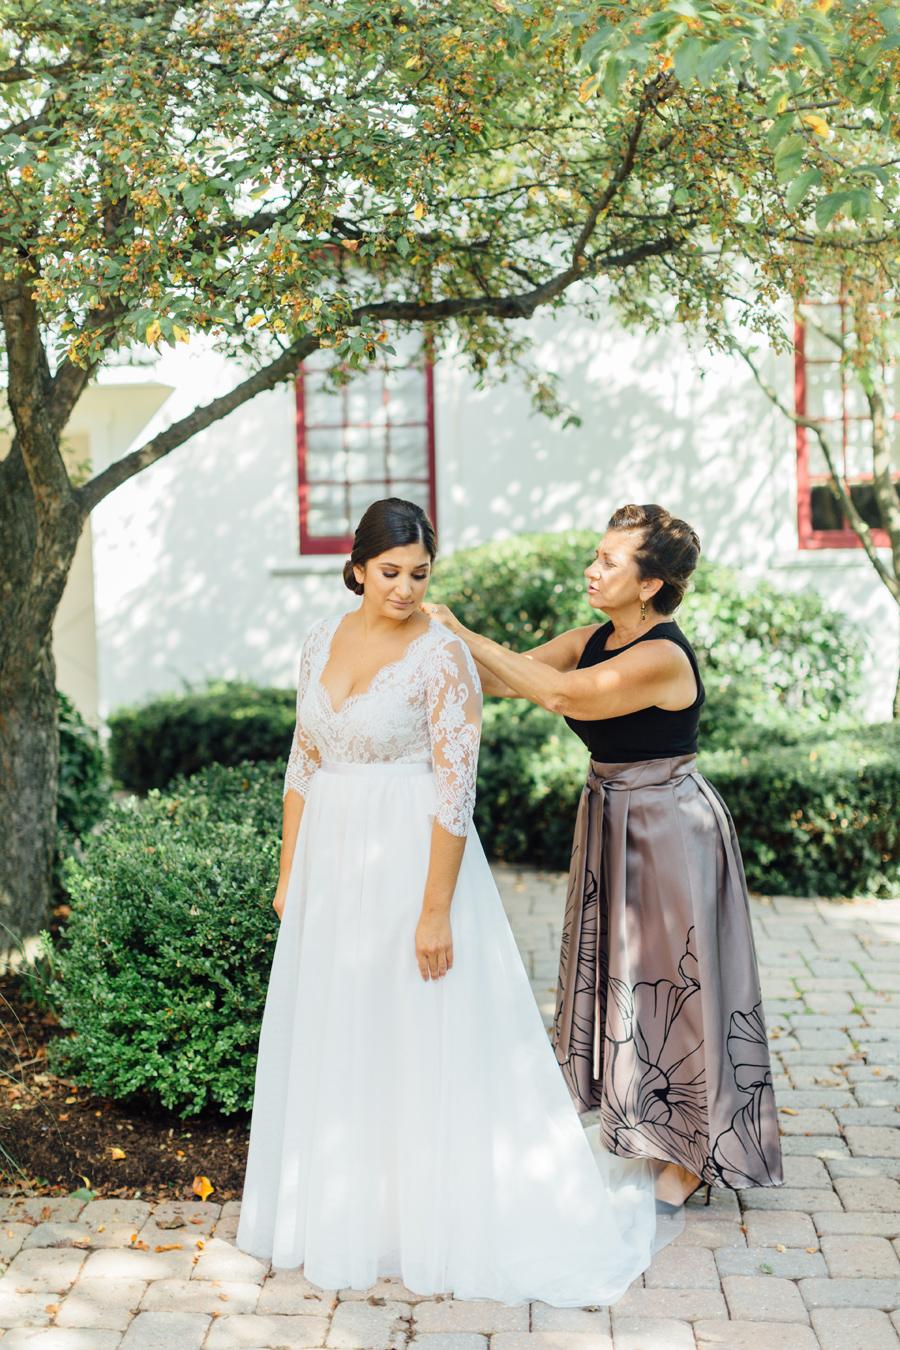 the-inn-at-leola-wedding-lancaster-pennsylvania-wedding-photographer-rebeka-viola-photograhy (12).jpg